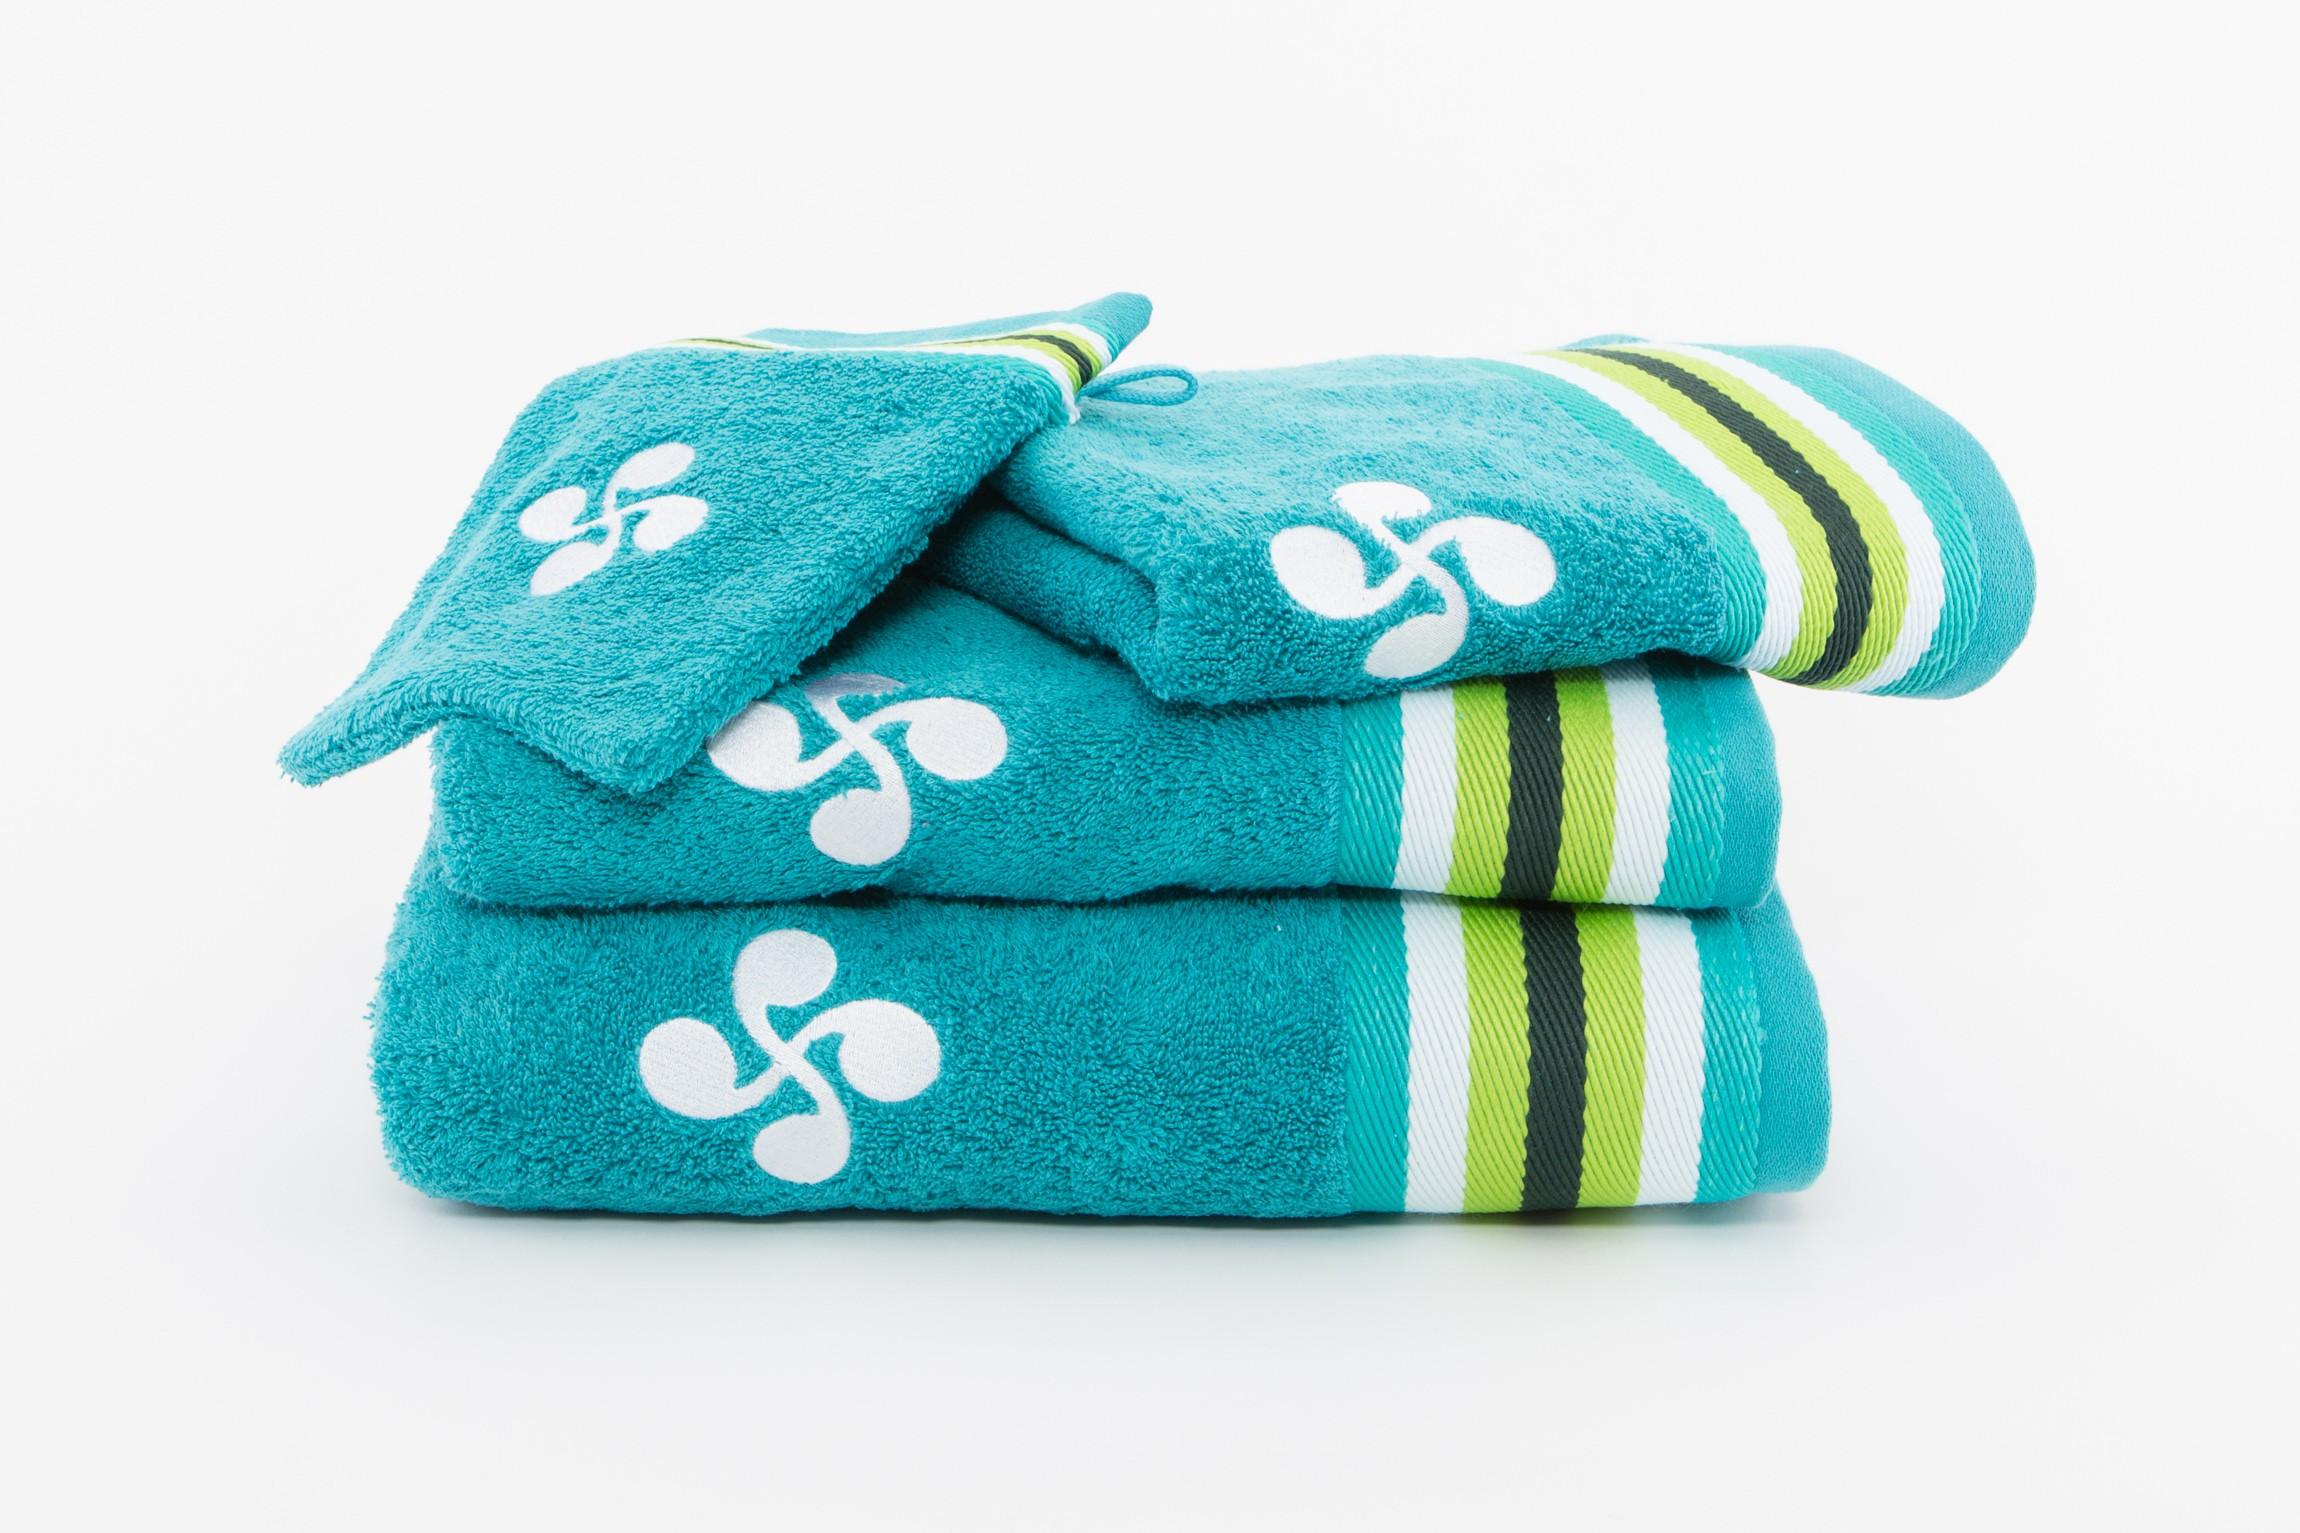 drap de bain turquoise galerie de garazi. Black Bedroom Furniture Sets. Home Design Ideas